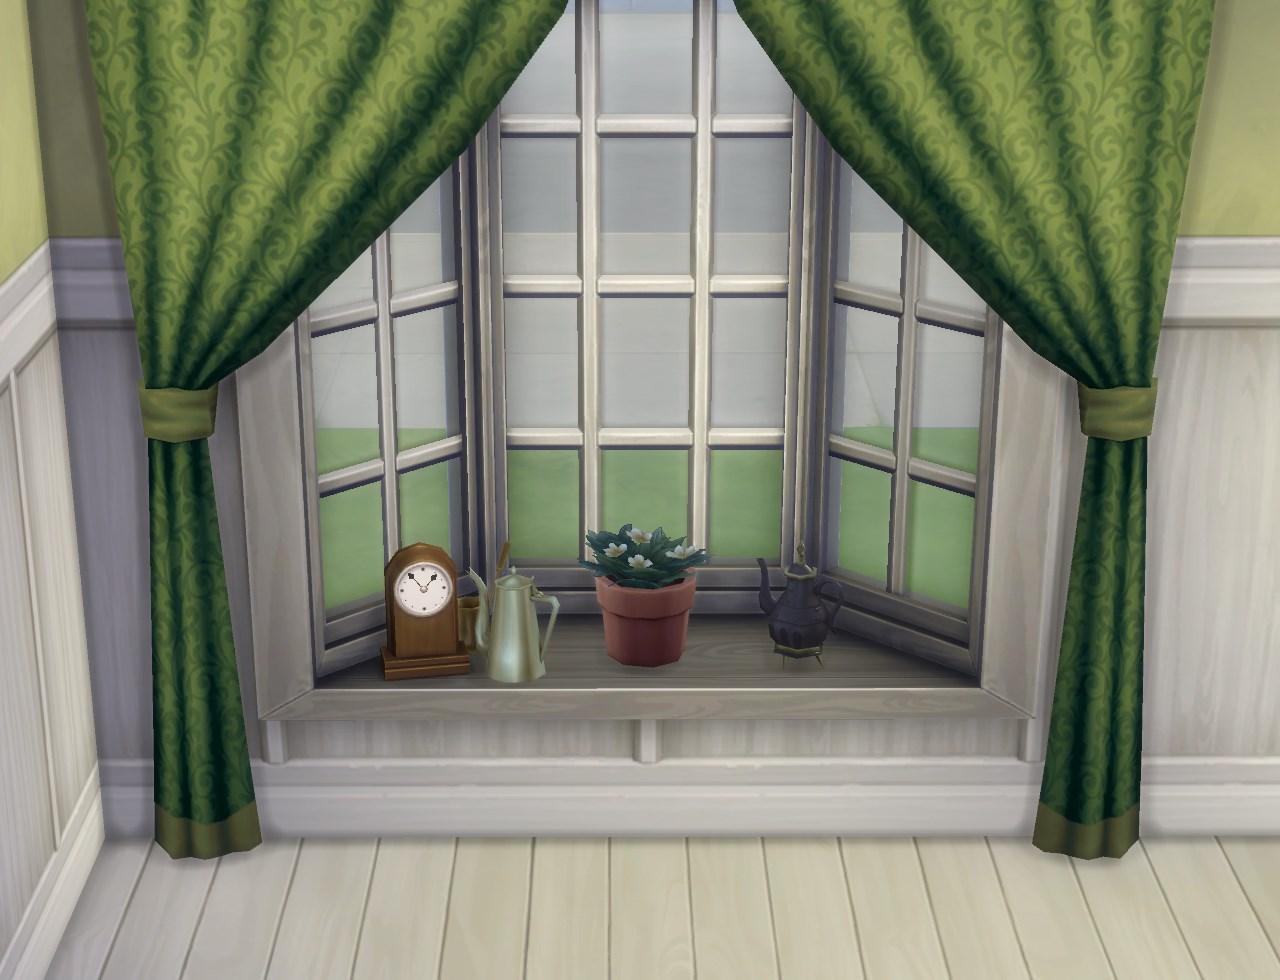 Mod The Sims Basic Bay Window Slots